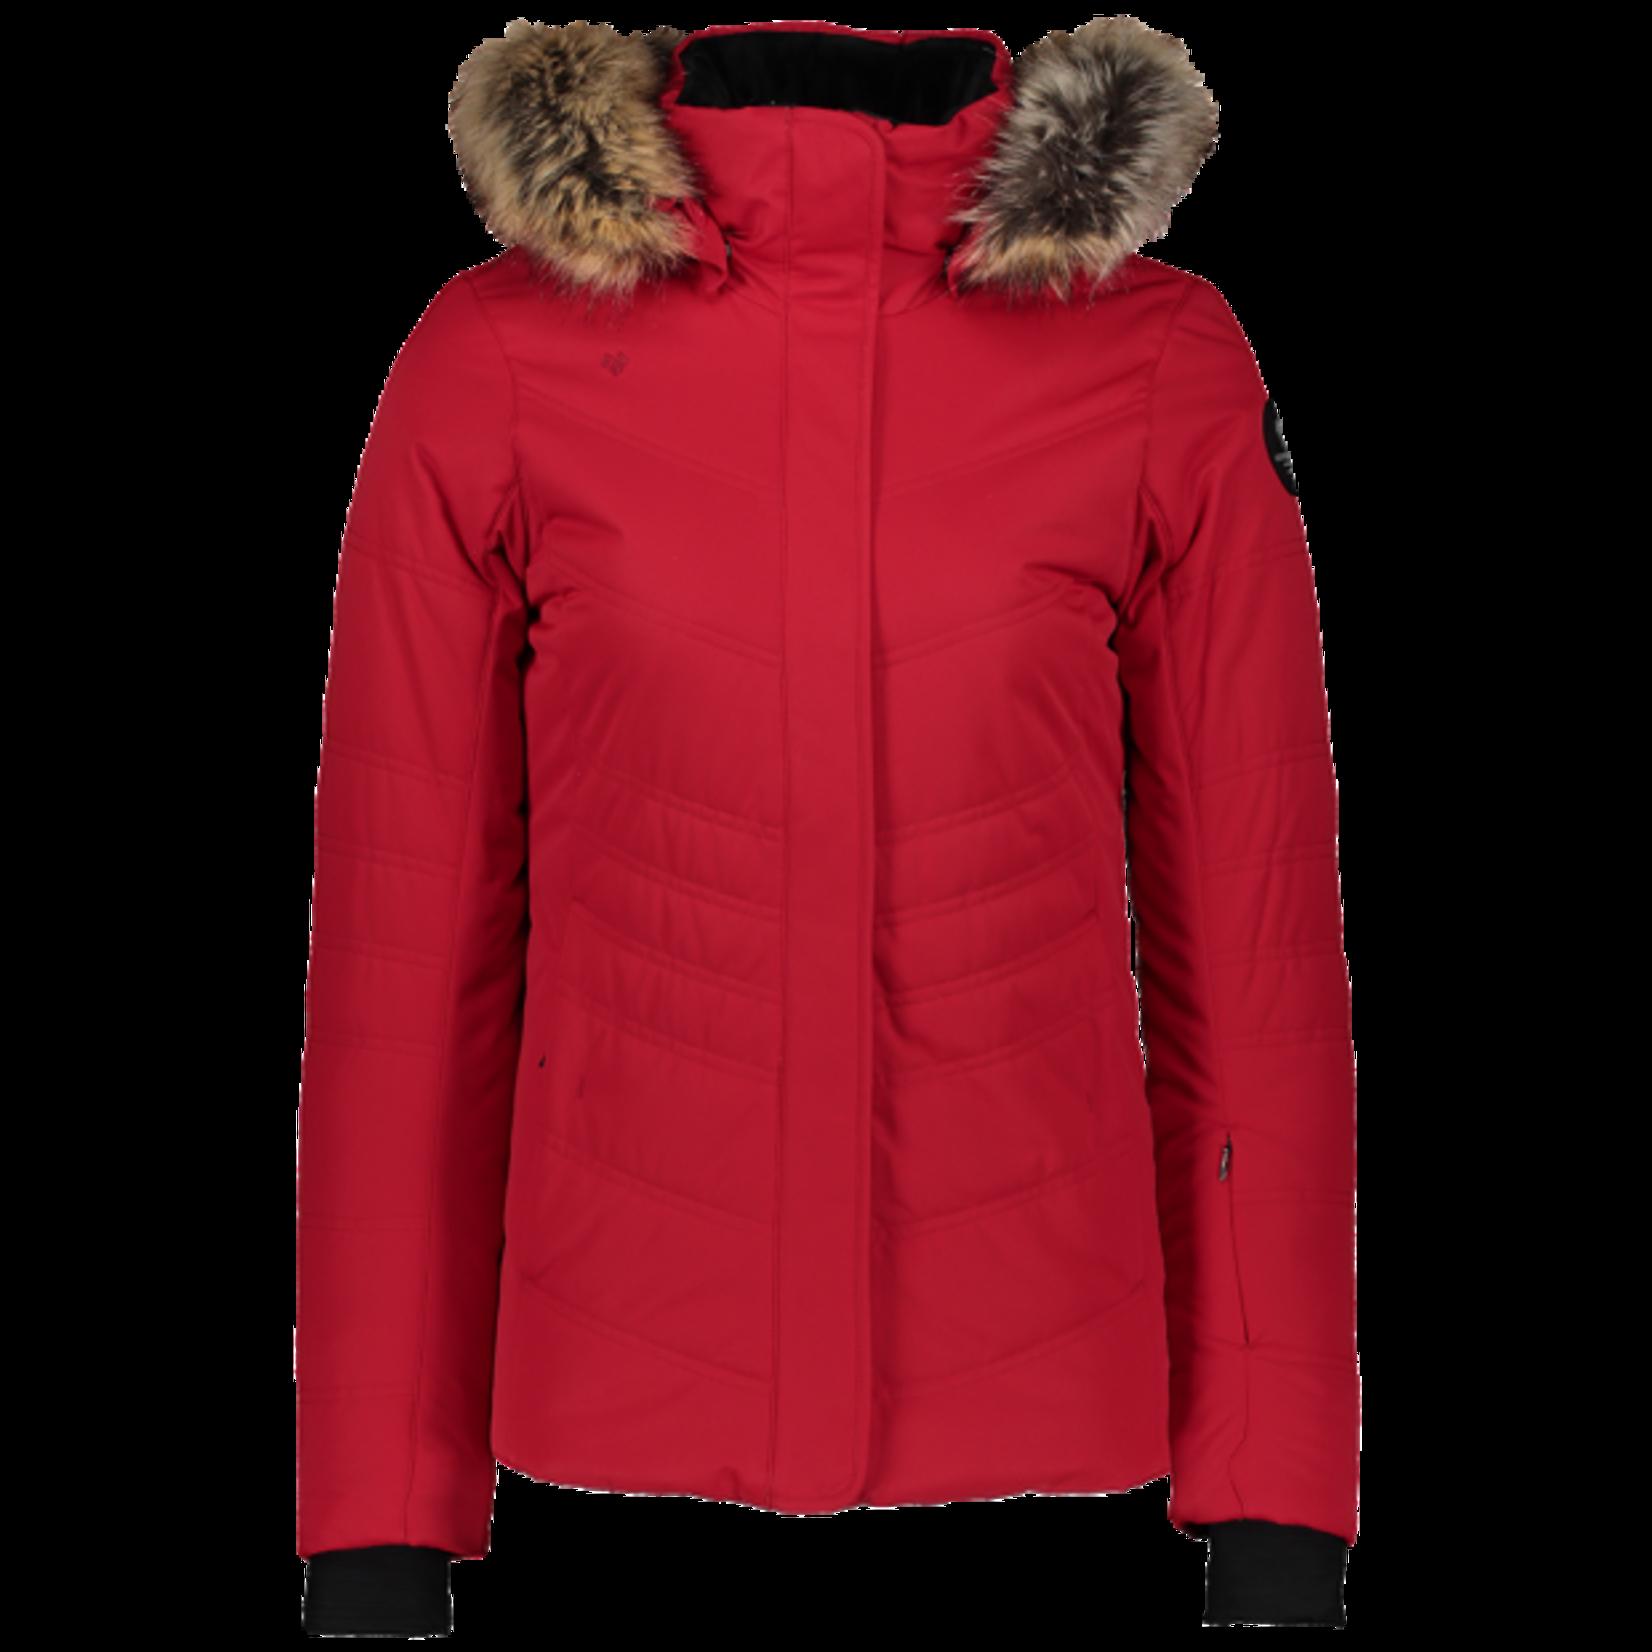 Obermeyer Obermeyer Women's Tuscany II Insulated Jacket